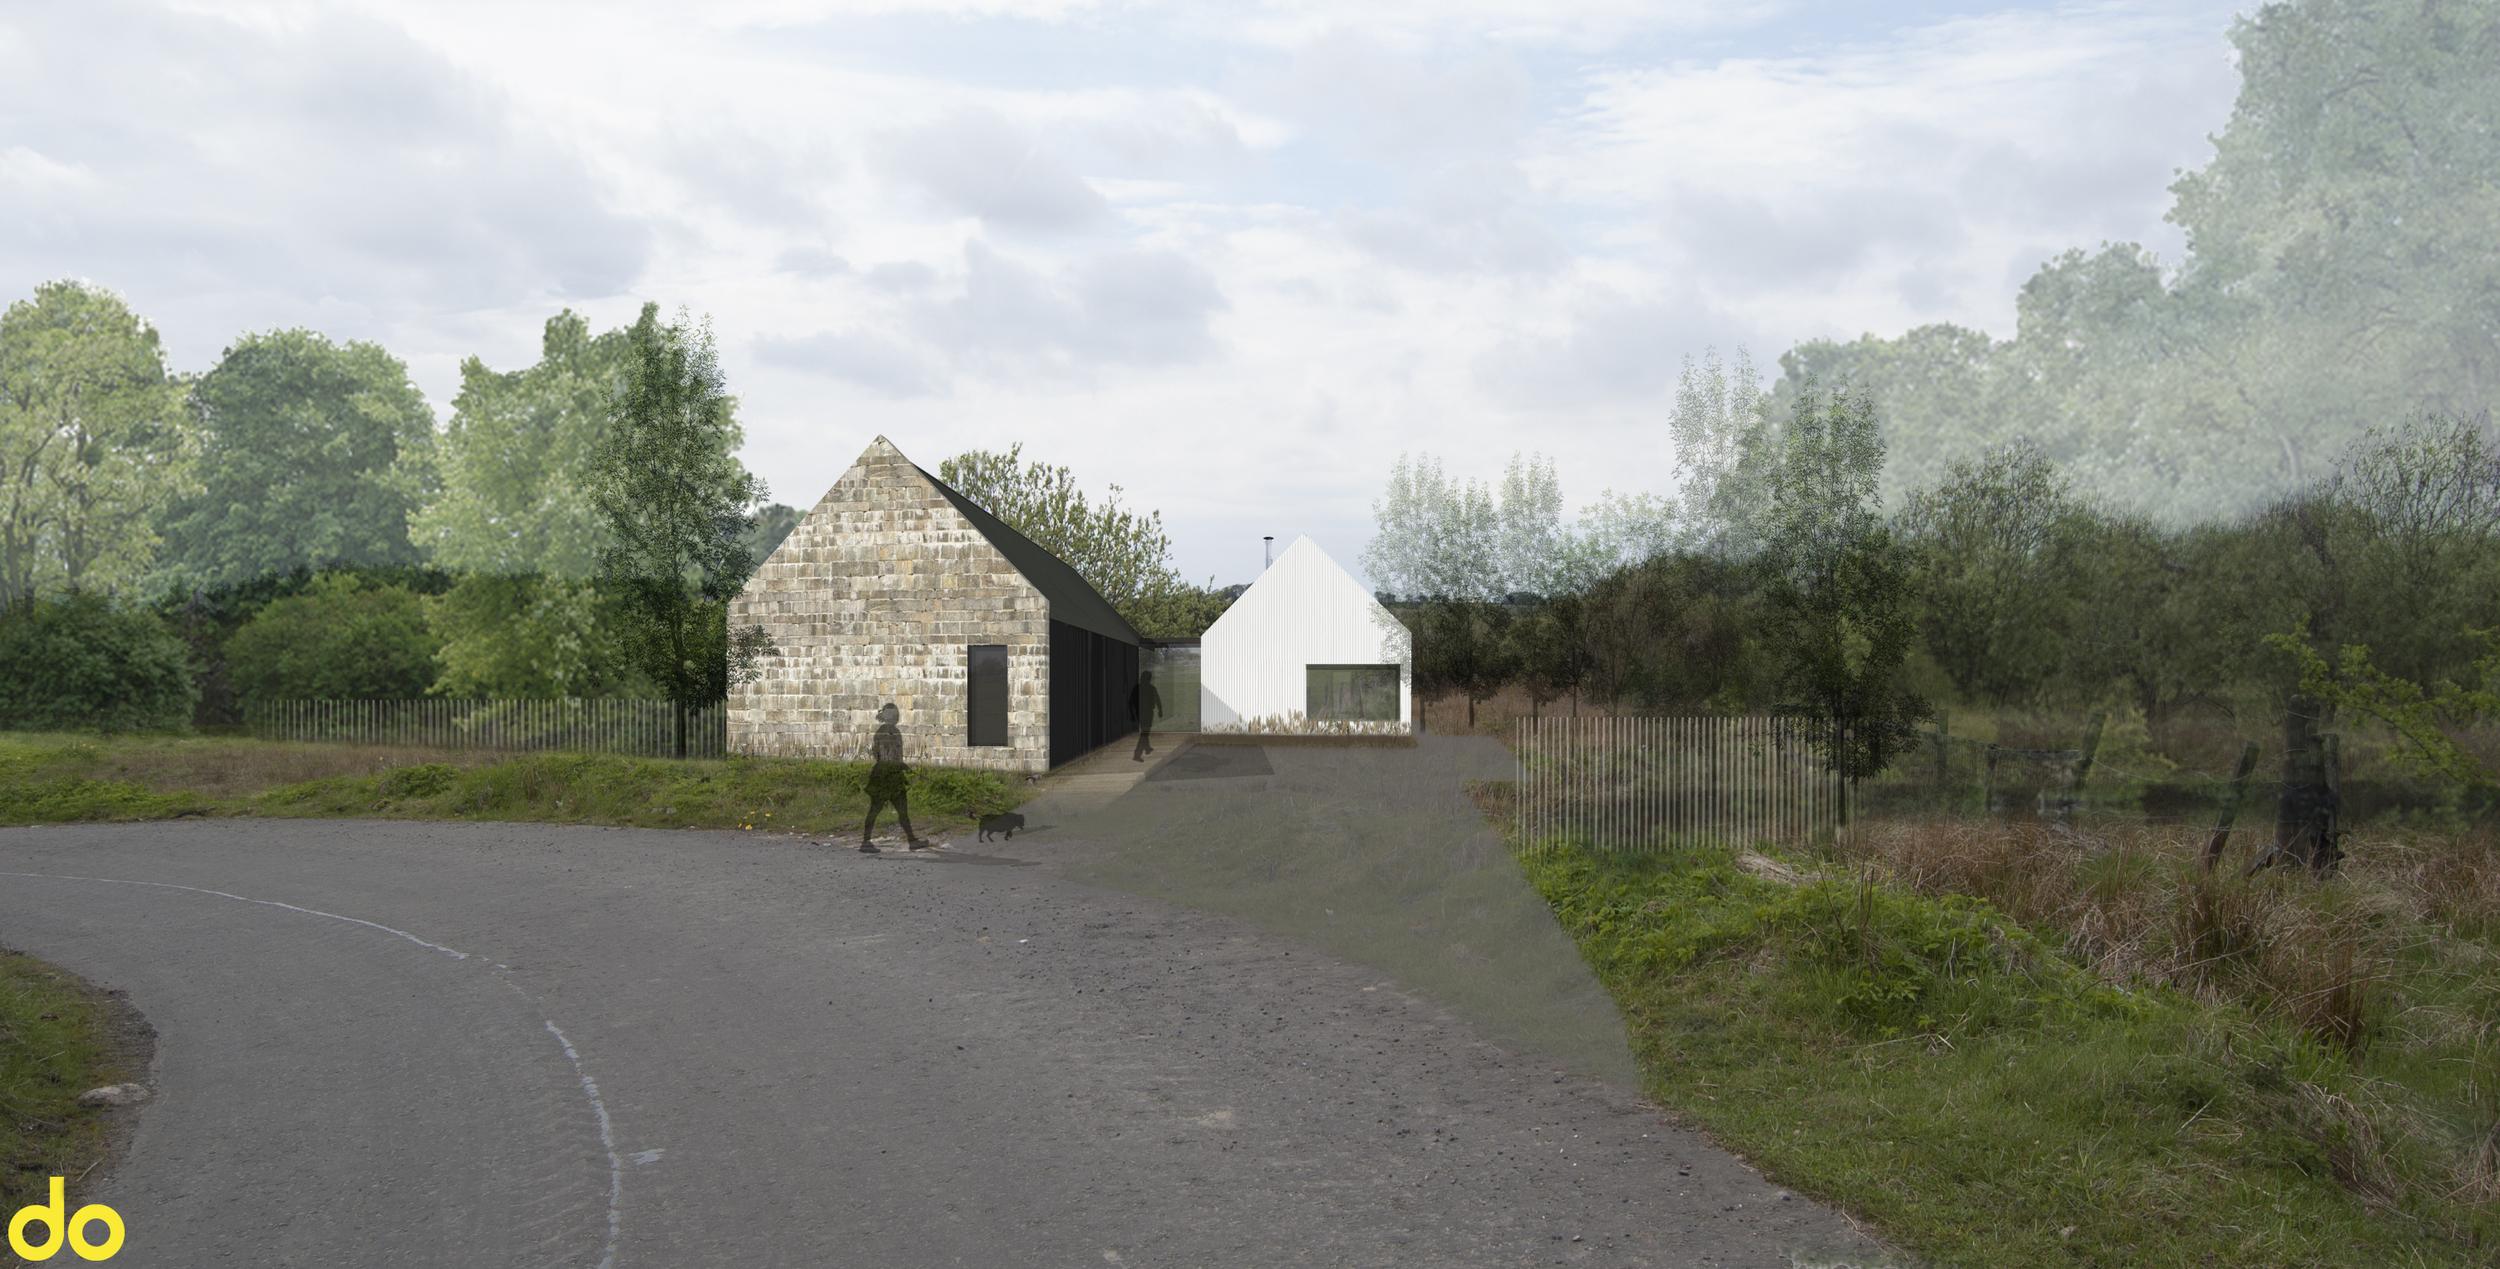 Arbuckle Cottage | DO-Architecture